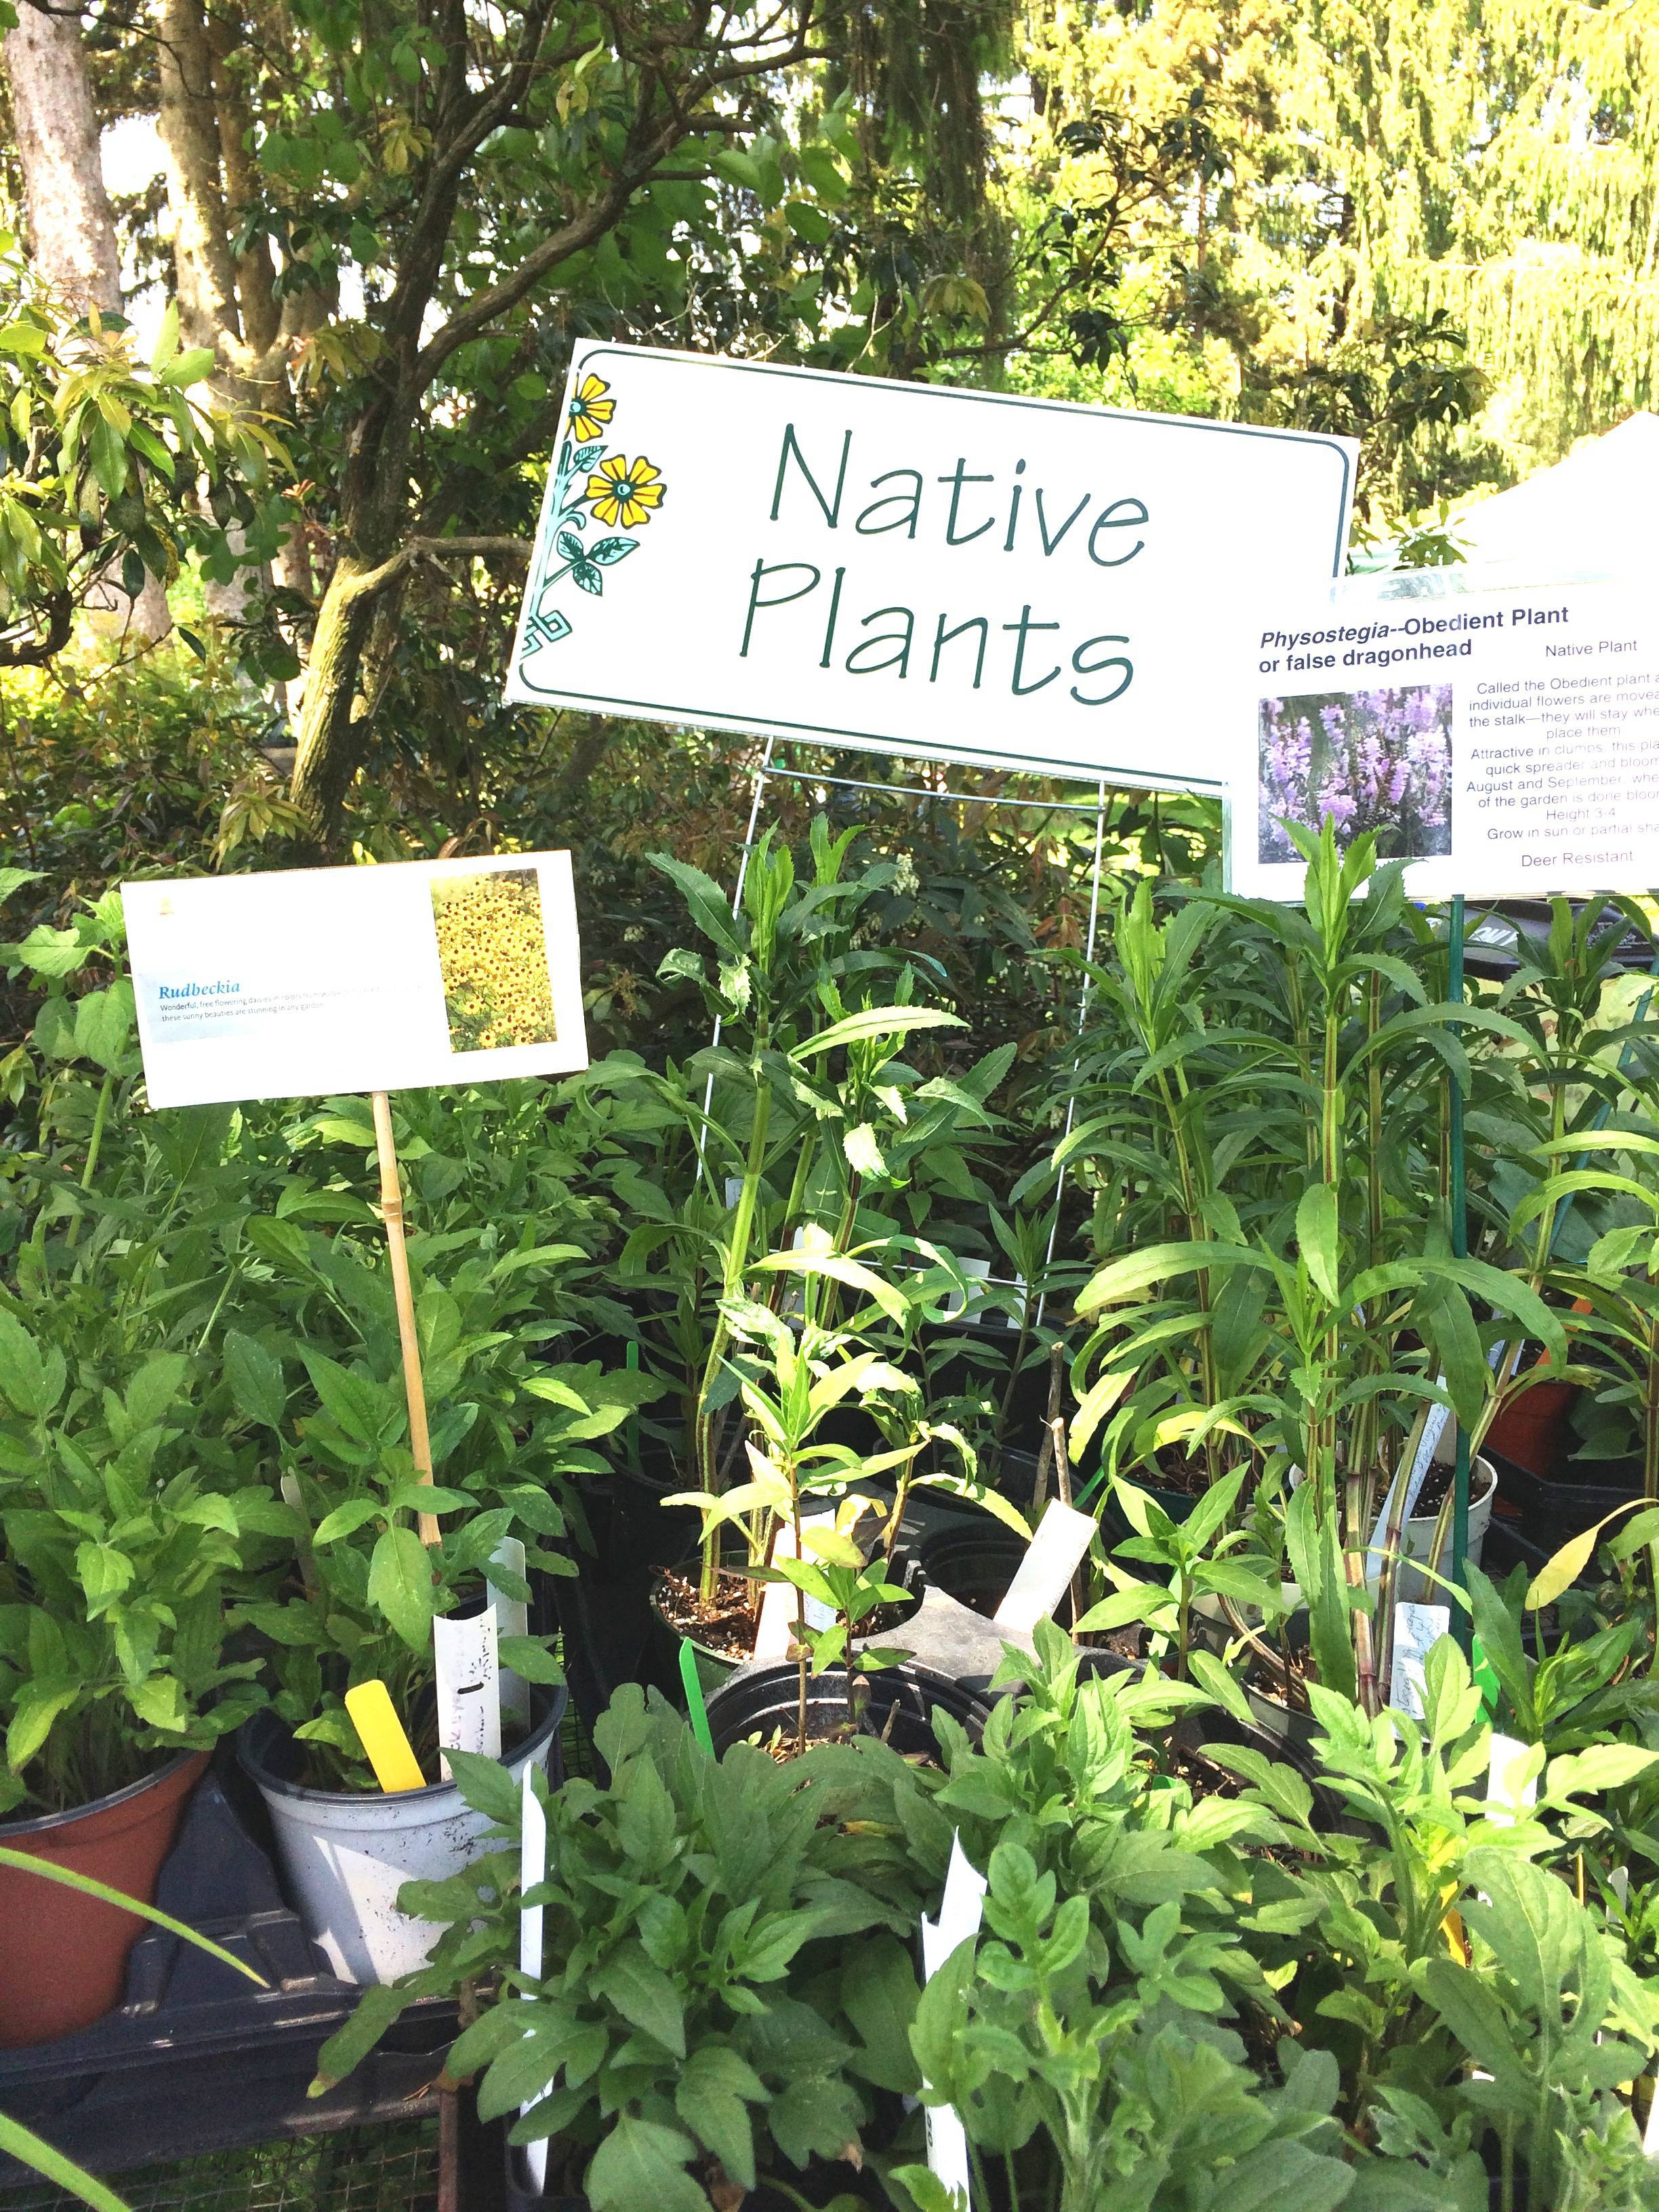 5c6a54c97cc8ec4dc85d_Native_Plants.jpg